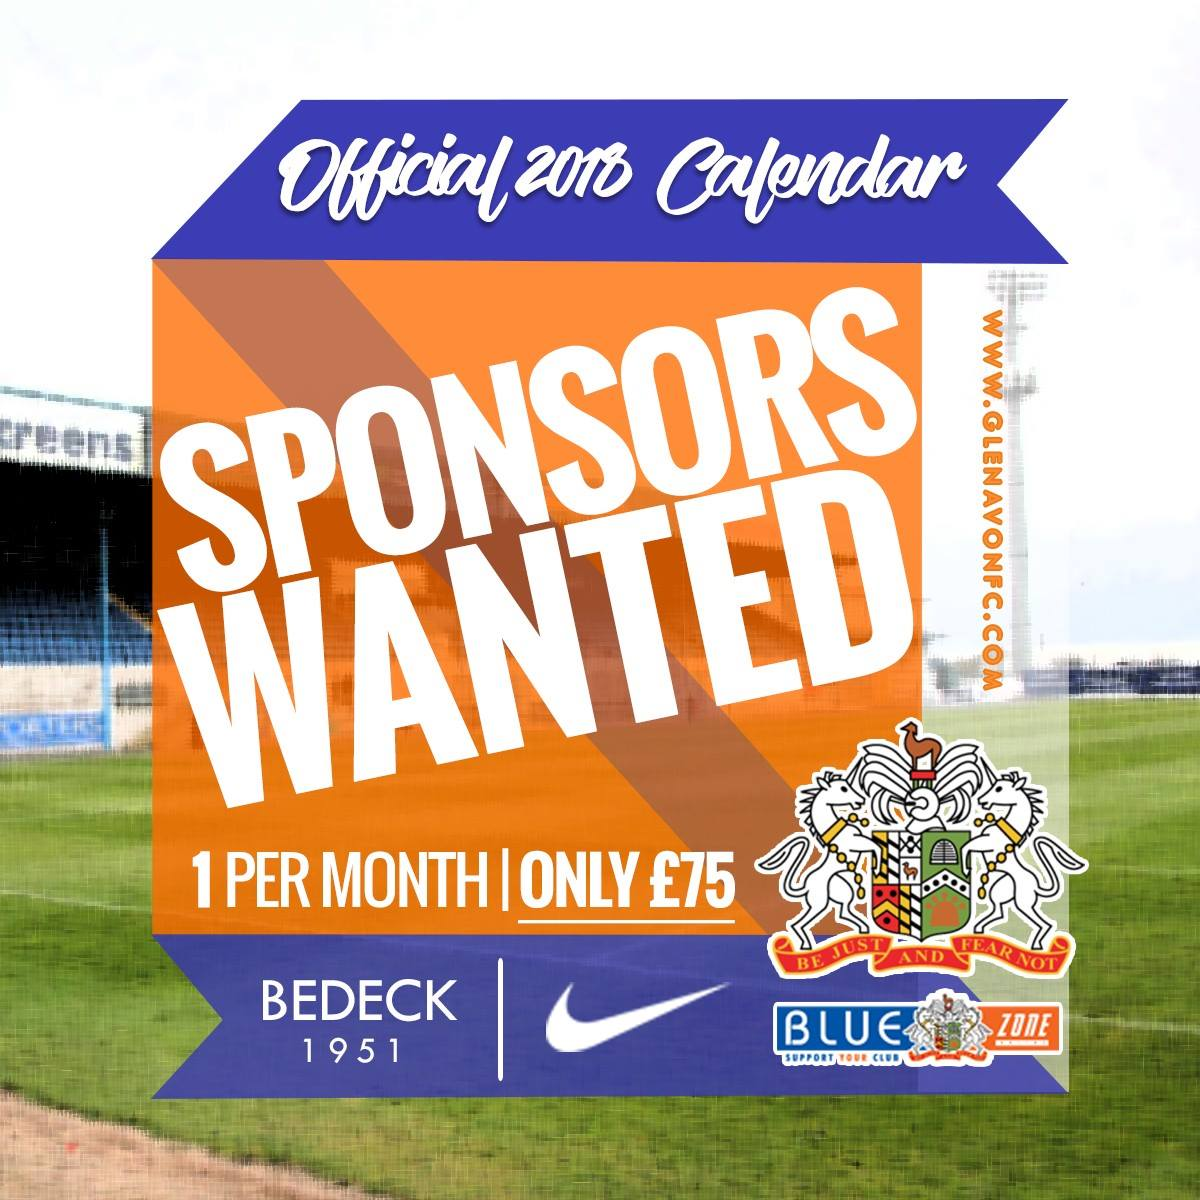 Official 2018 Calendar Sponsors Wanted